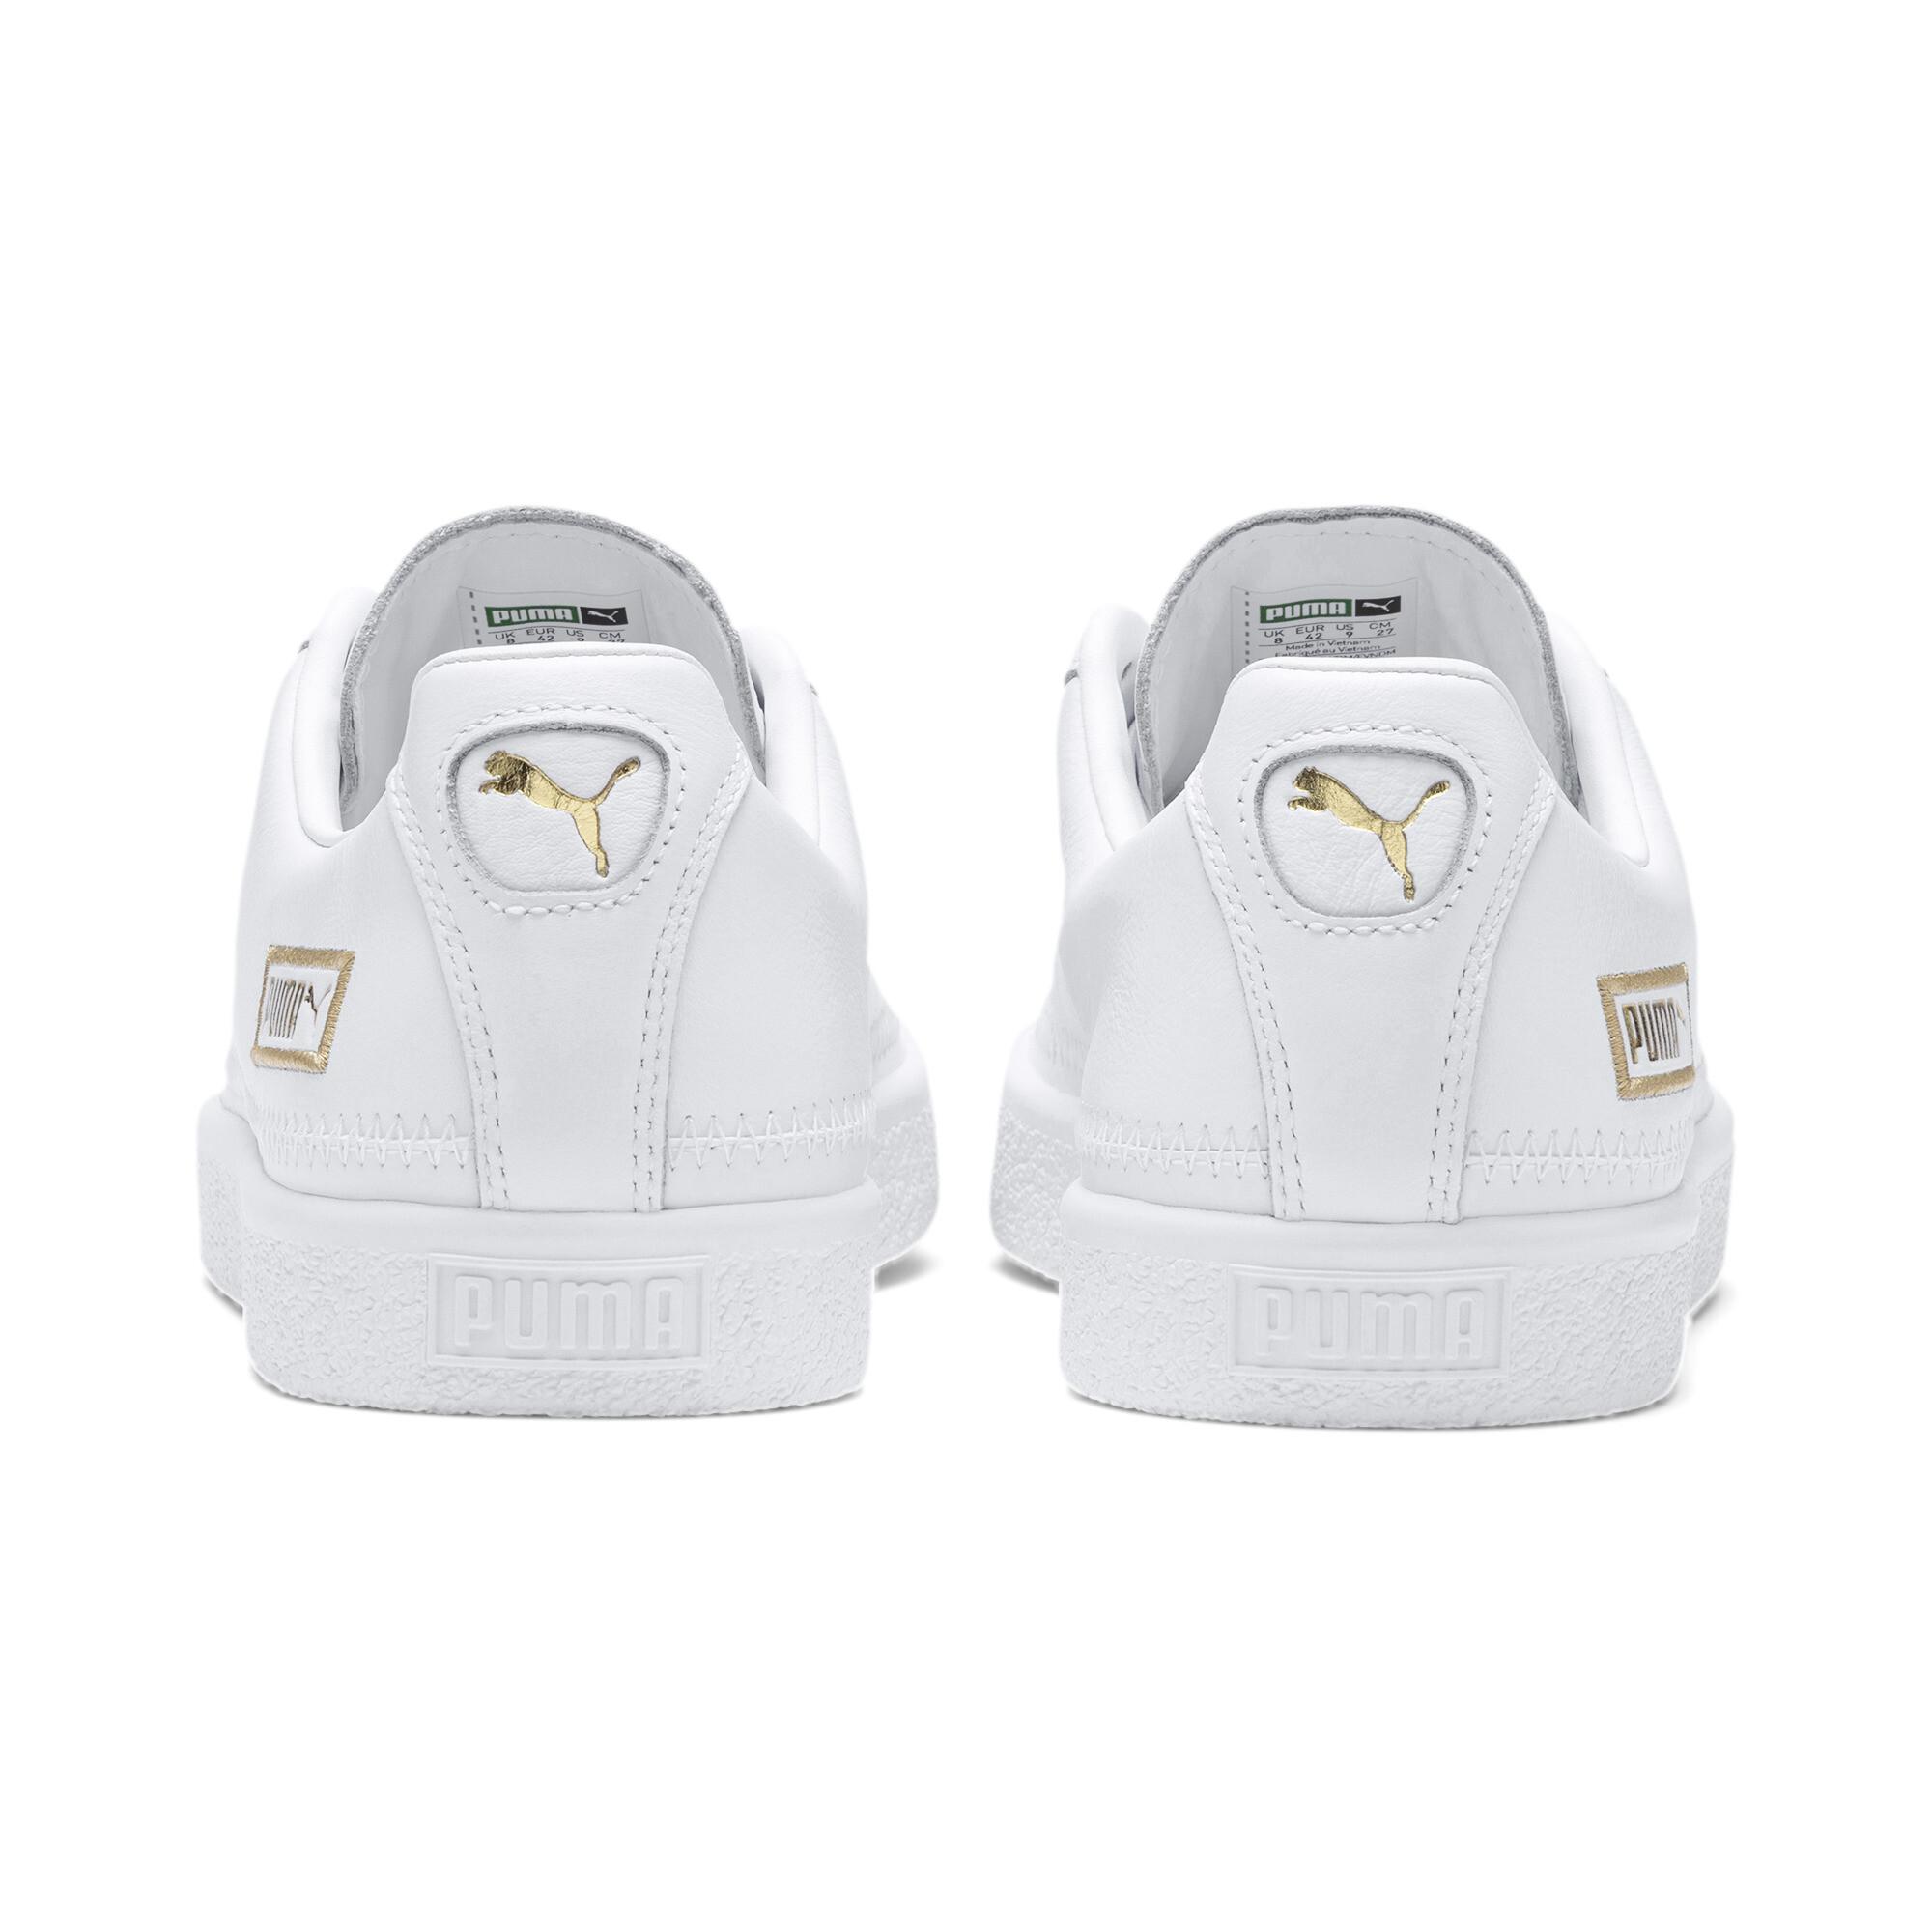 Indexbild 3 - PUMA Basket Stitch Sneaker Unisex Schuhe Neu